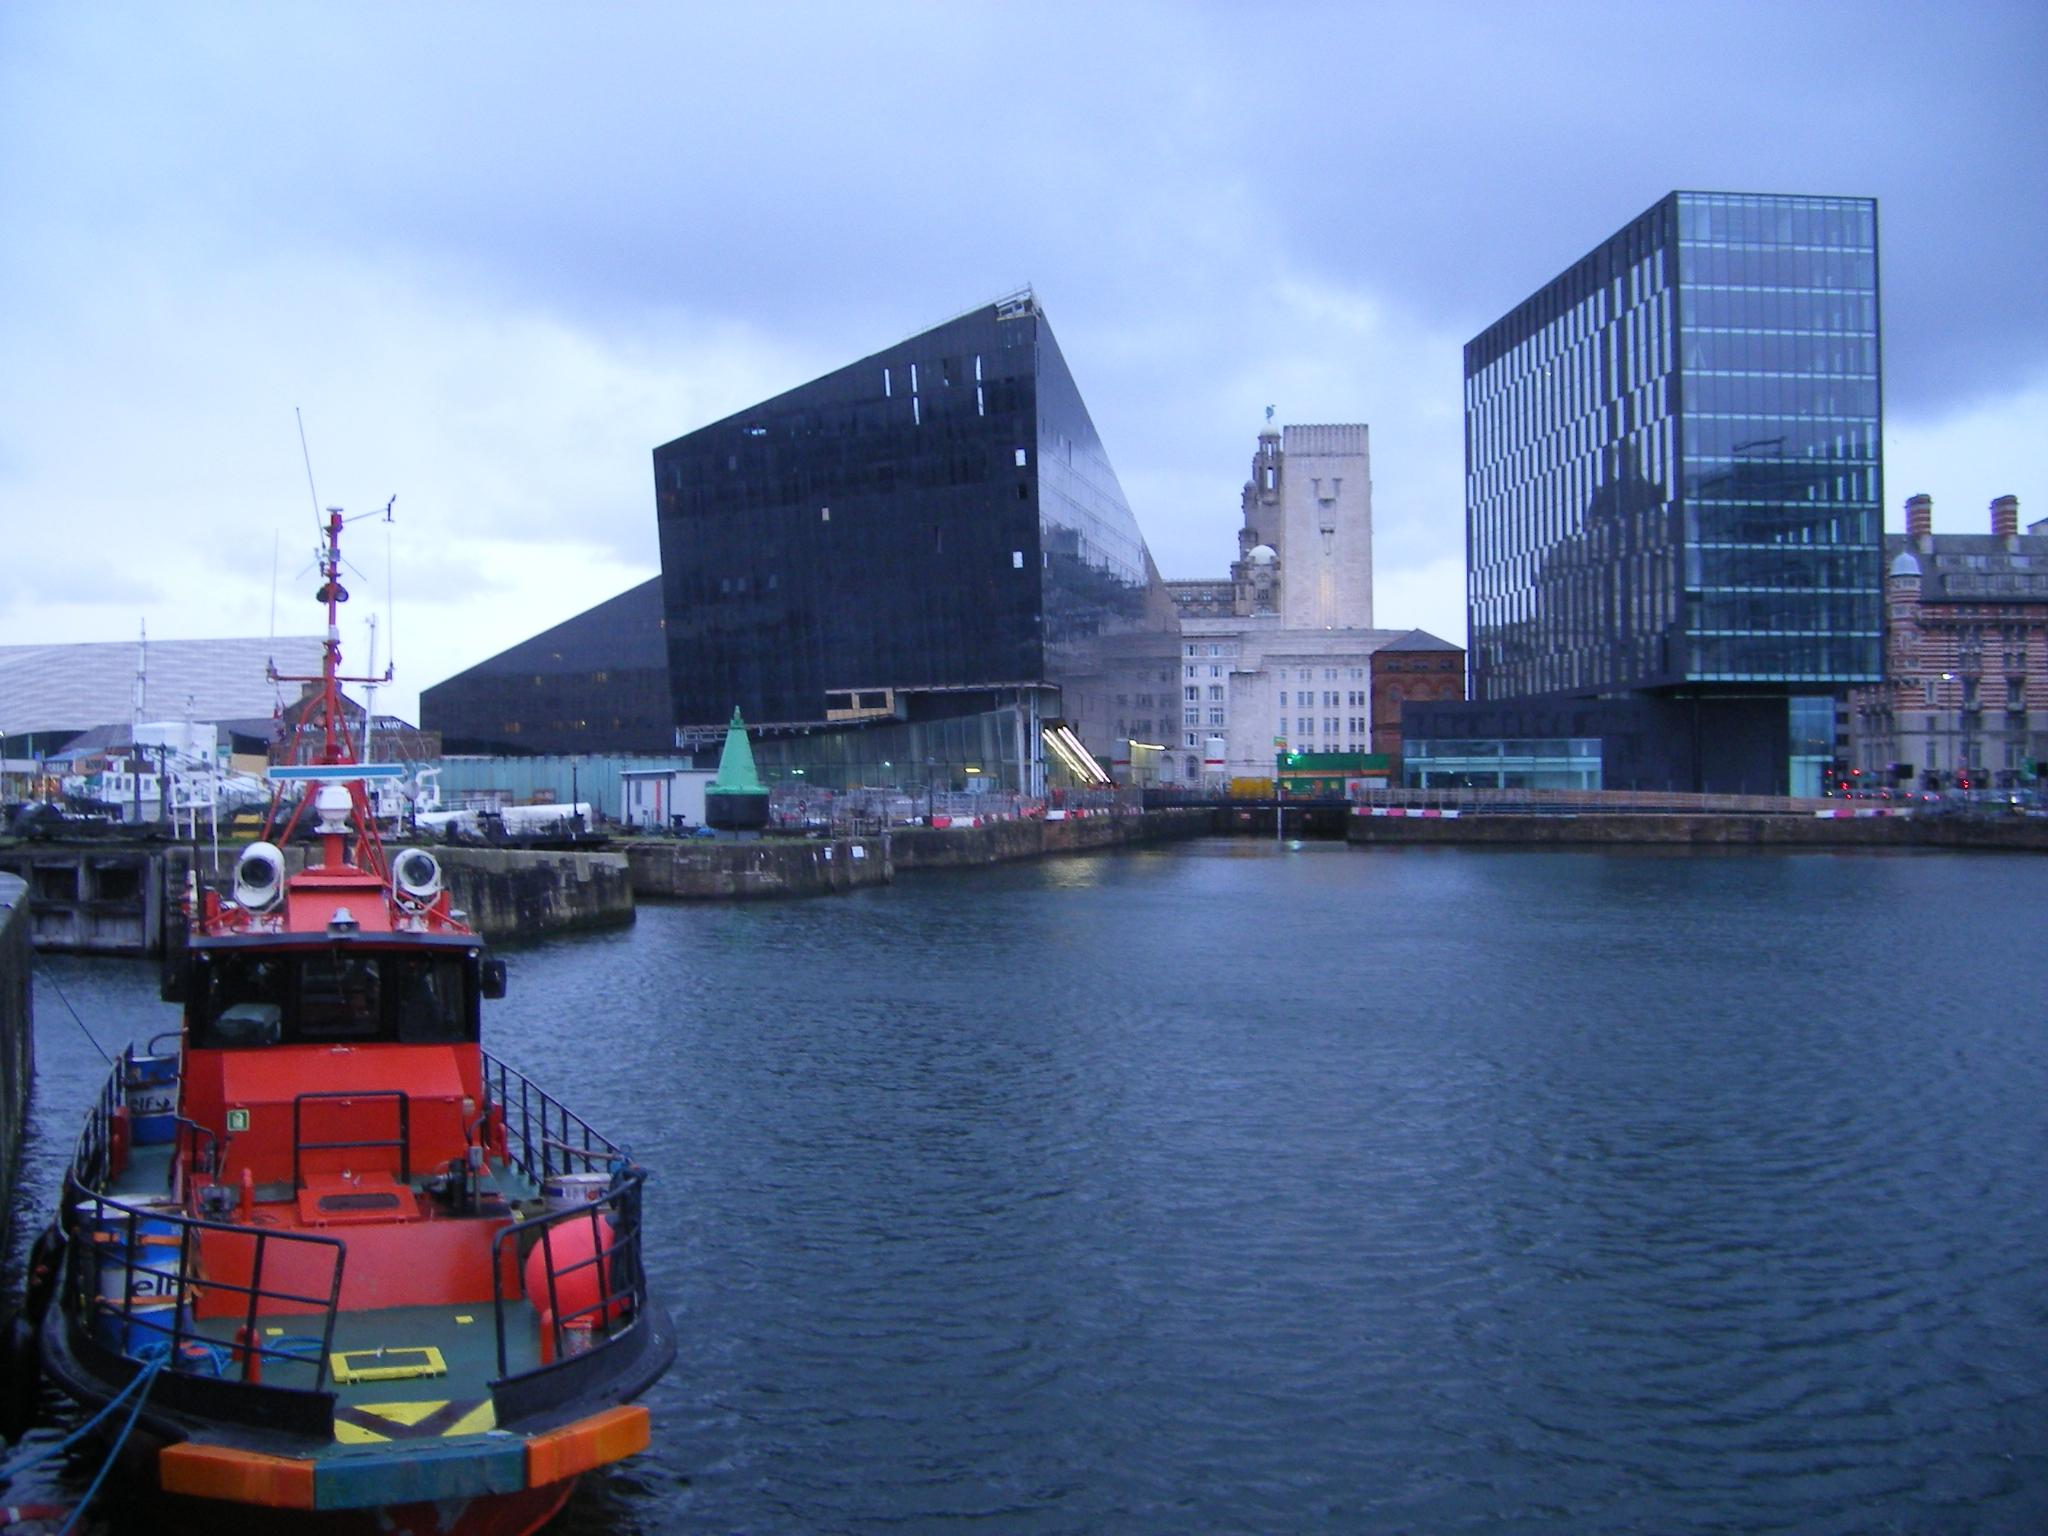 Docks à Liverpool